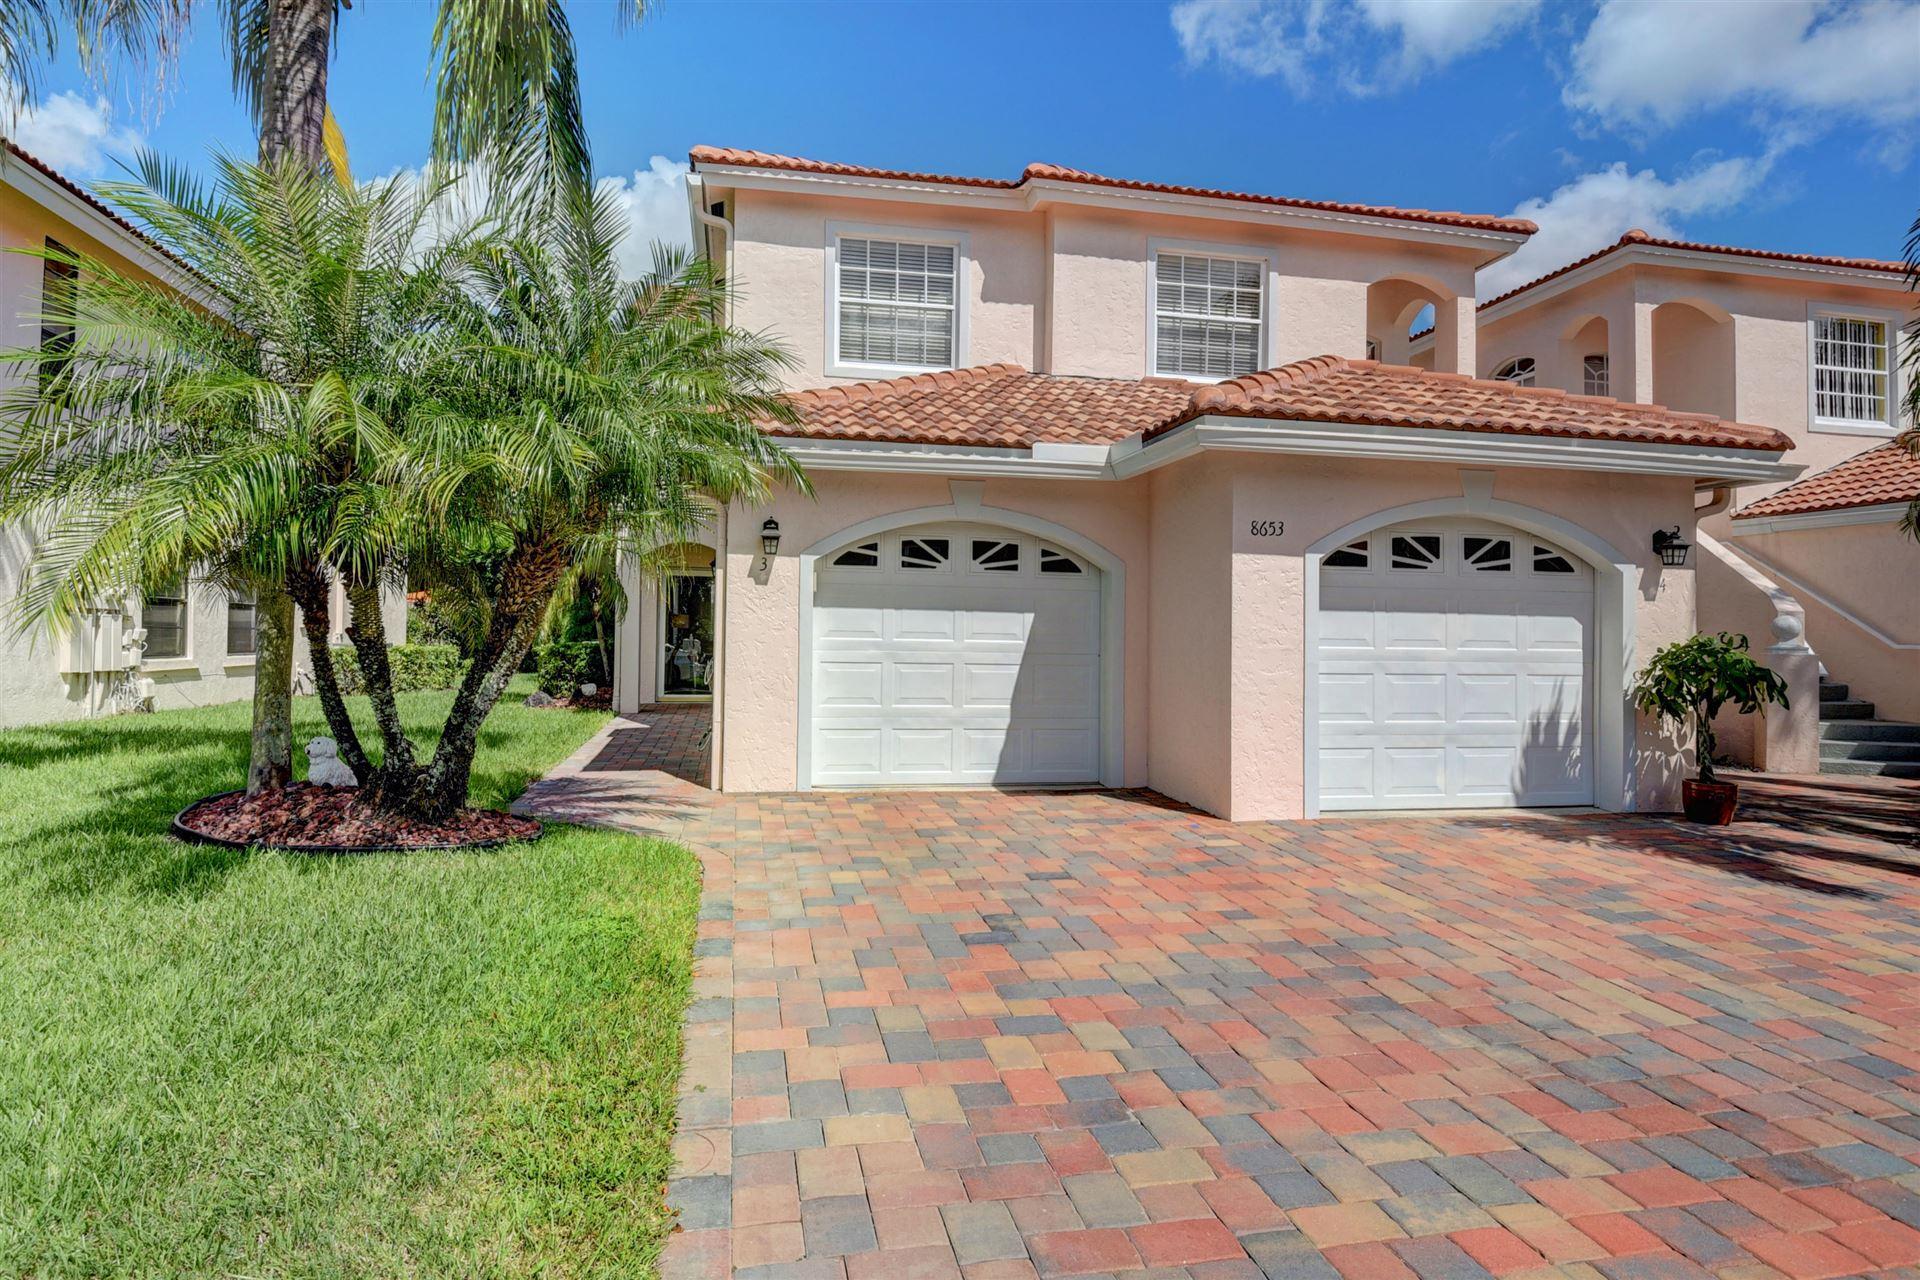 8653 Via Reale #3, Boca Raton, FL 33496 - #: RX-10662765